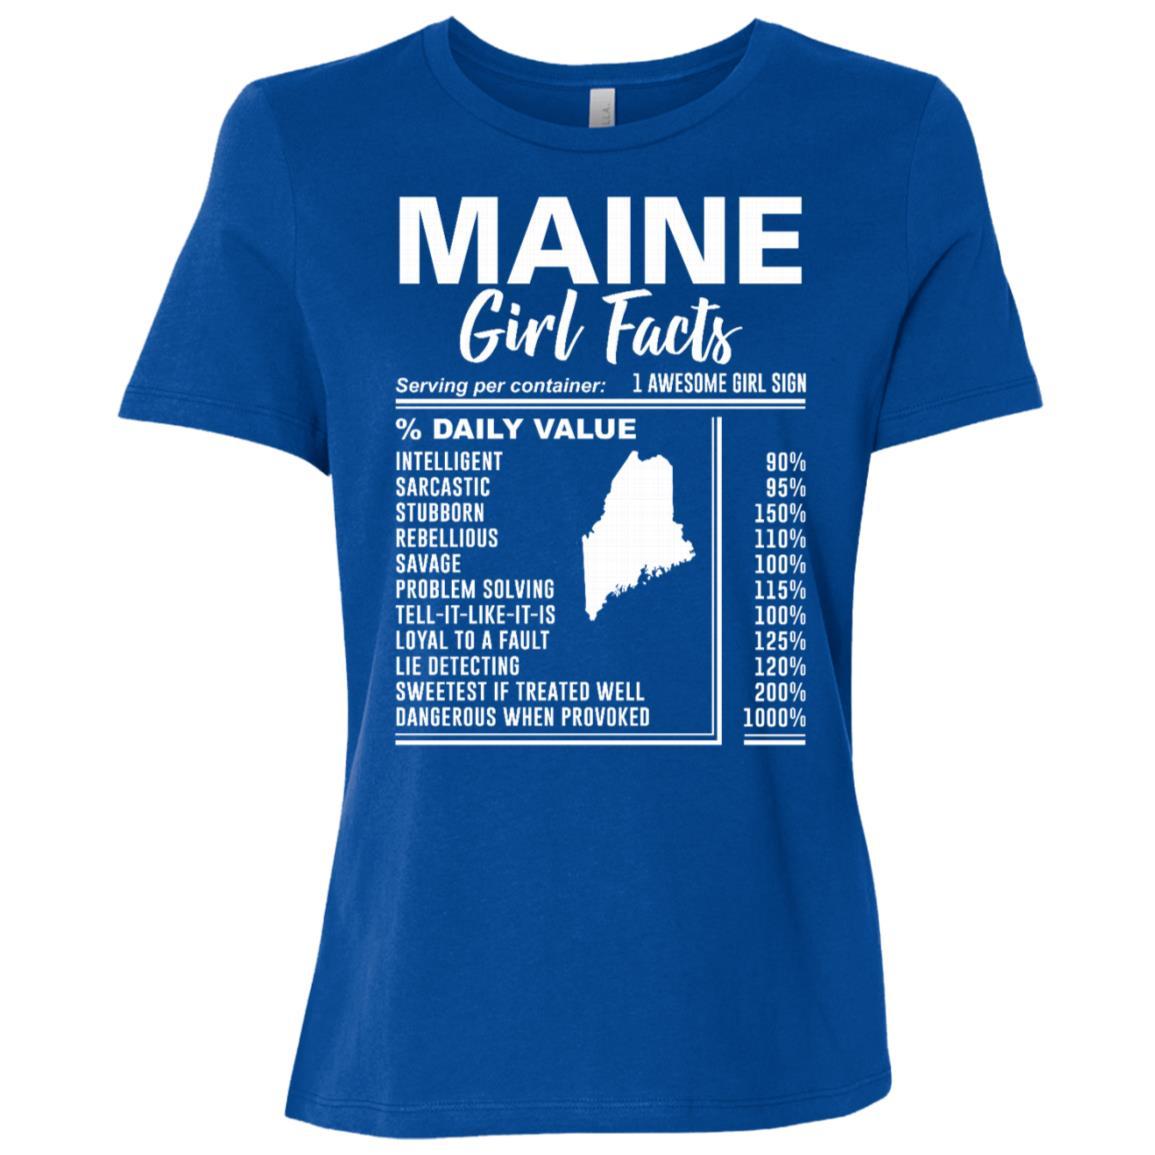 Born in Maine – Maine Girl Facts Women Short Sleeve T-Shirt